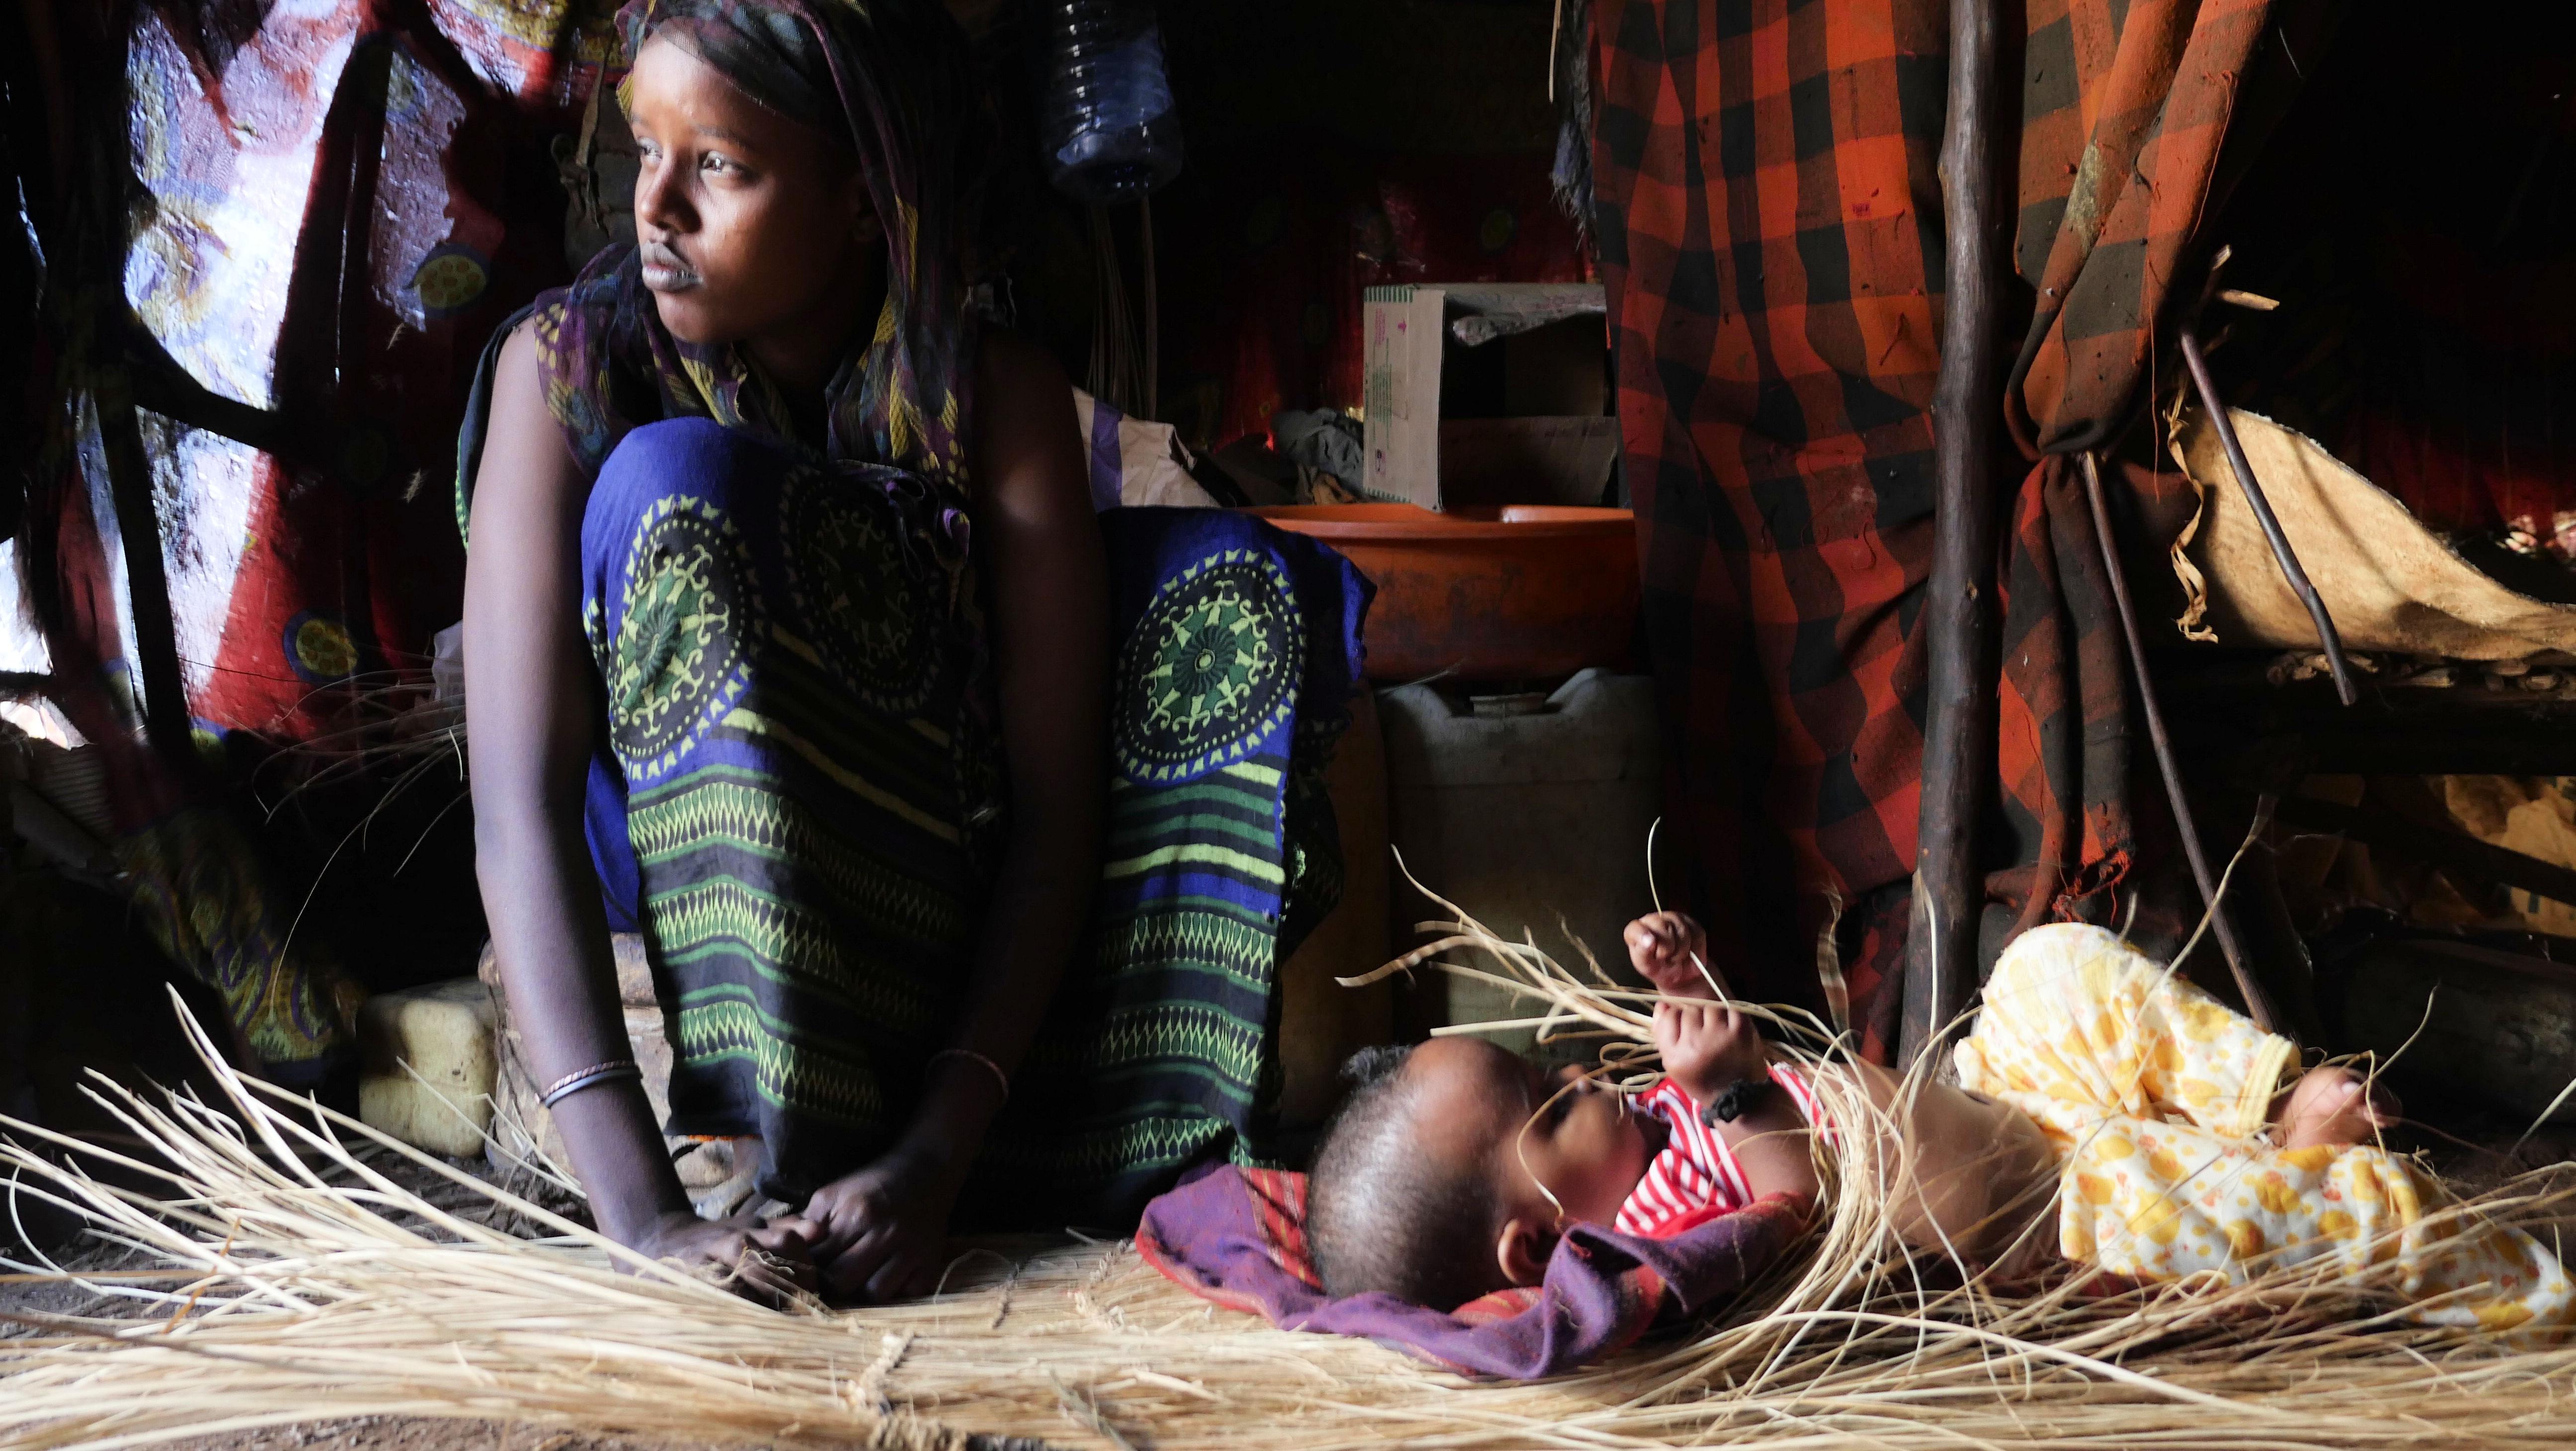 Die Dürre in Kenia trifft besonders Familien im Norden